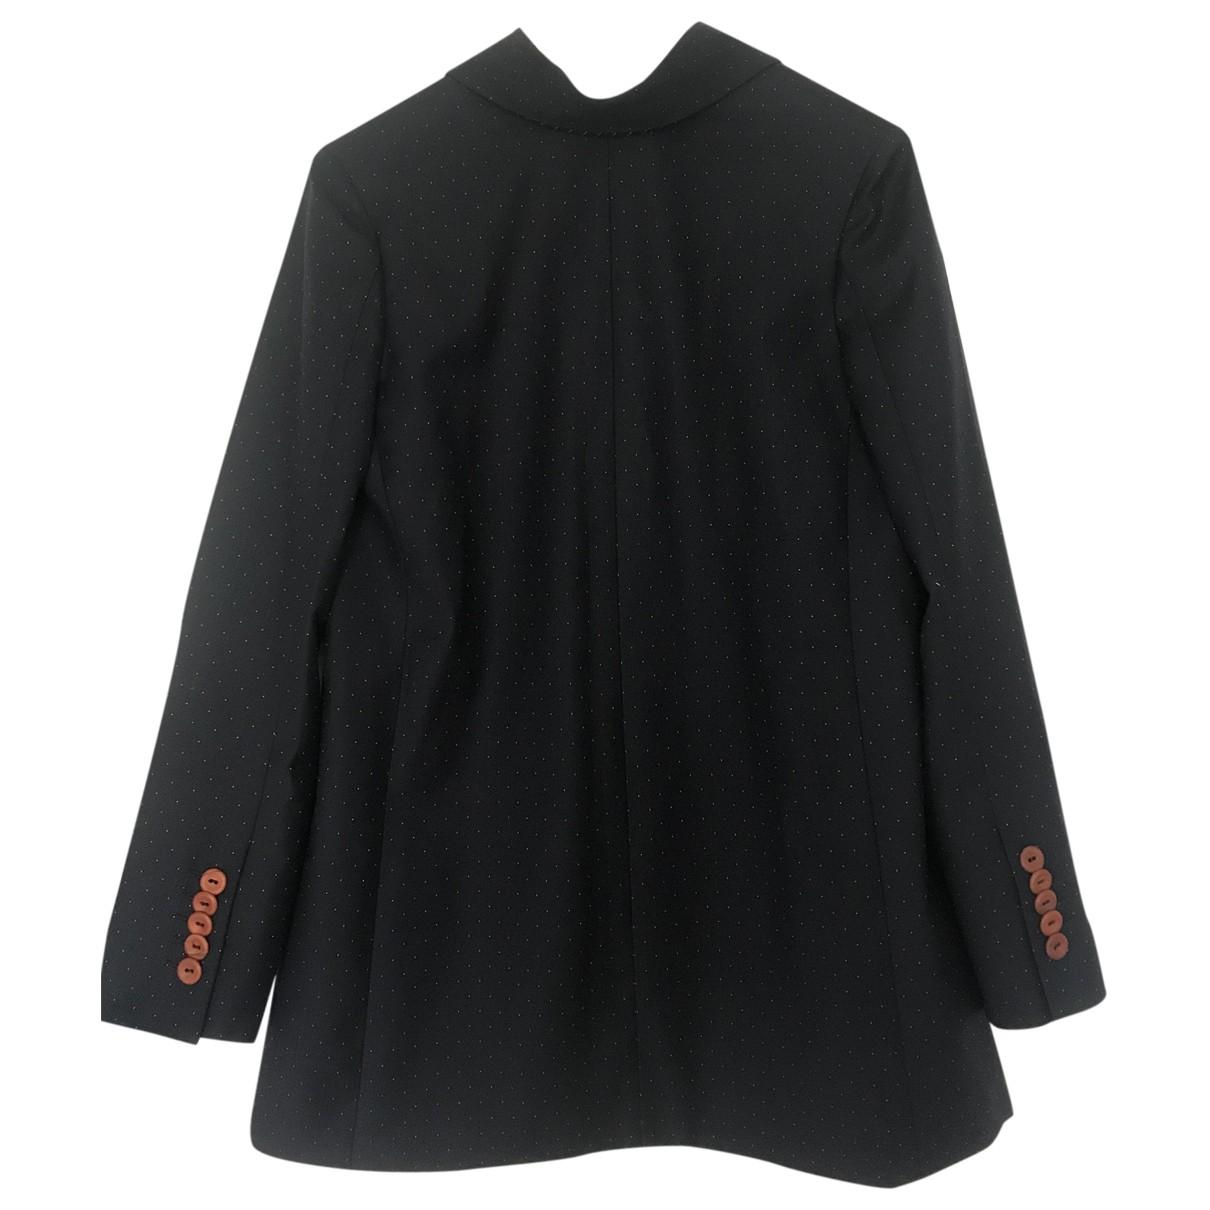 Acne Studios \N Navy Wool dress for Women 34 FR